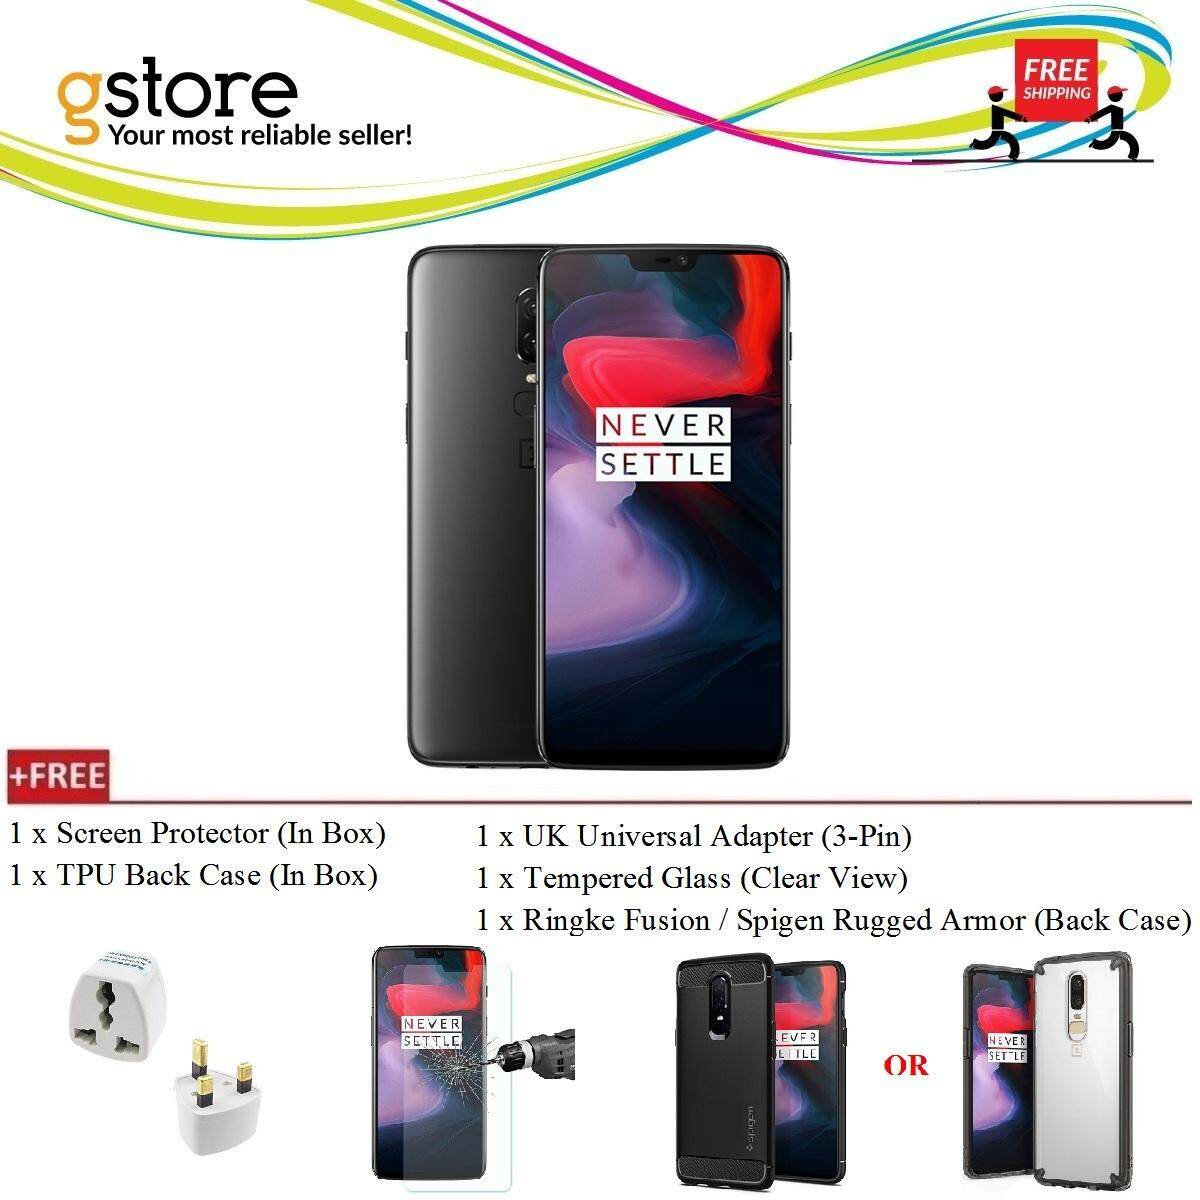 (Ready Stocks) OnePlus 6 A6000 [256GB ROM/8GB RAM] Global ROM + Free Gift  worth RM149!!!